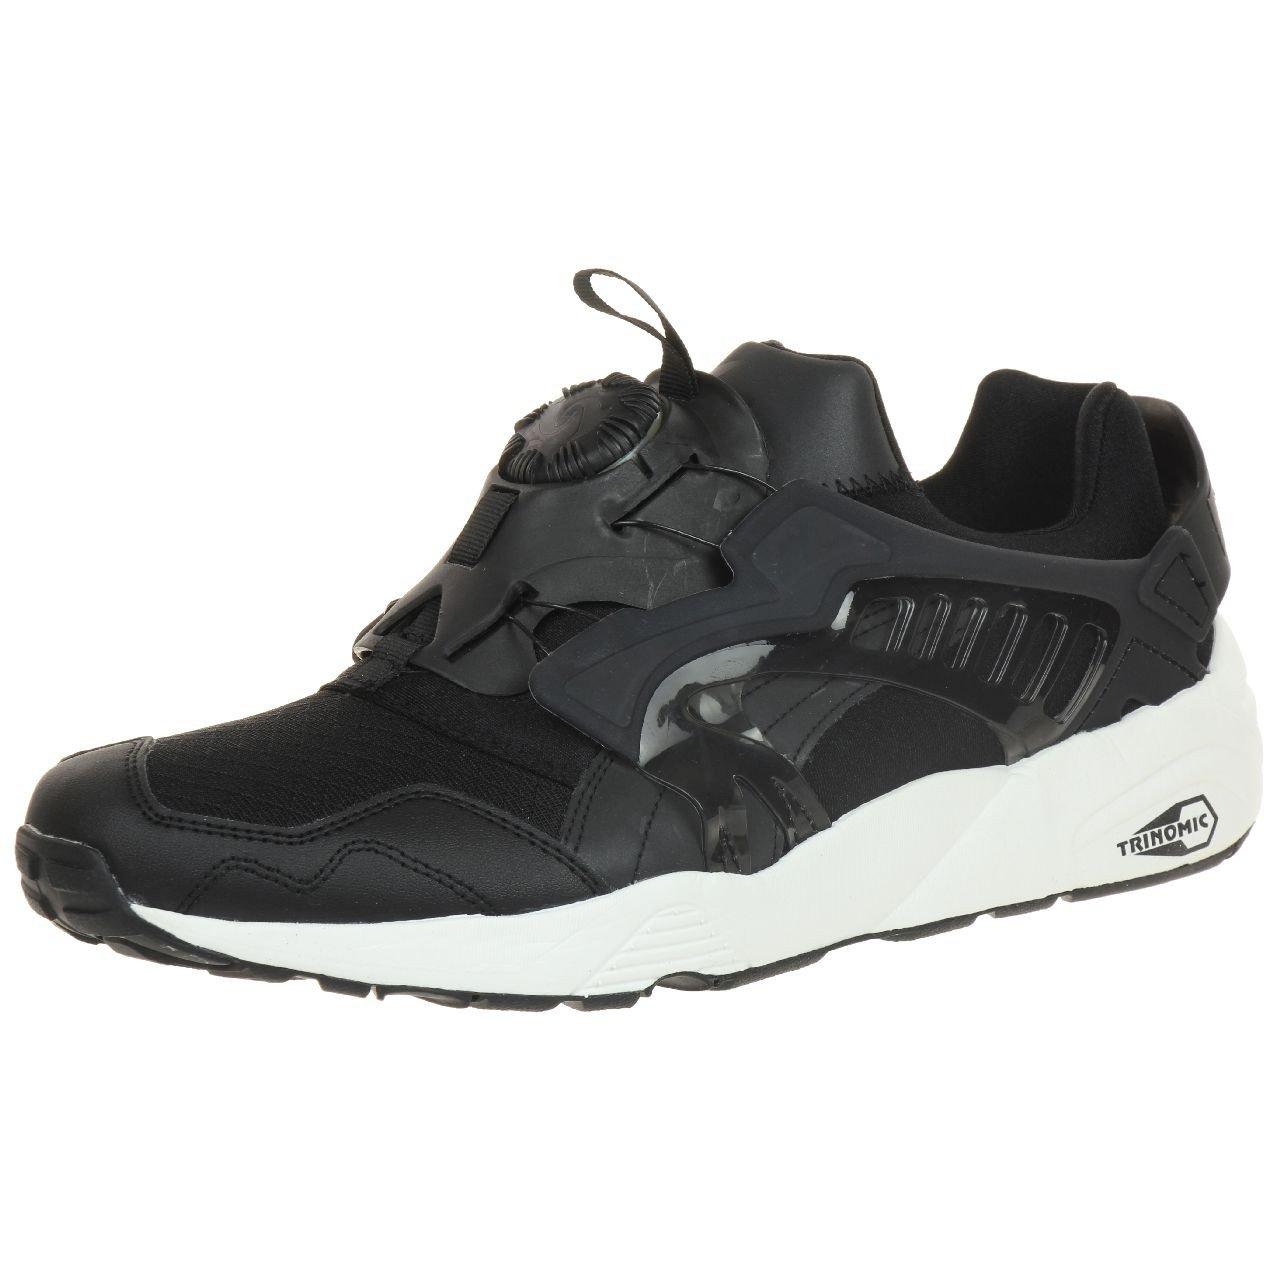 Puma Disc Blaze Modern Schuhe 10,5 schwarz Weiß